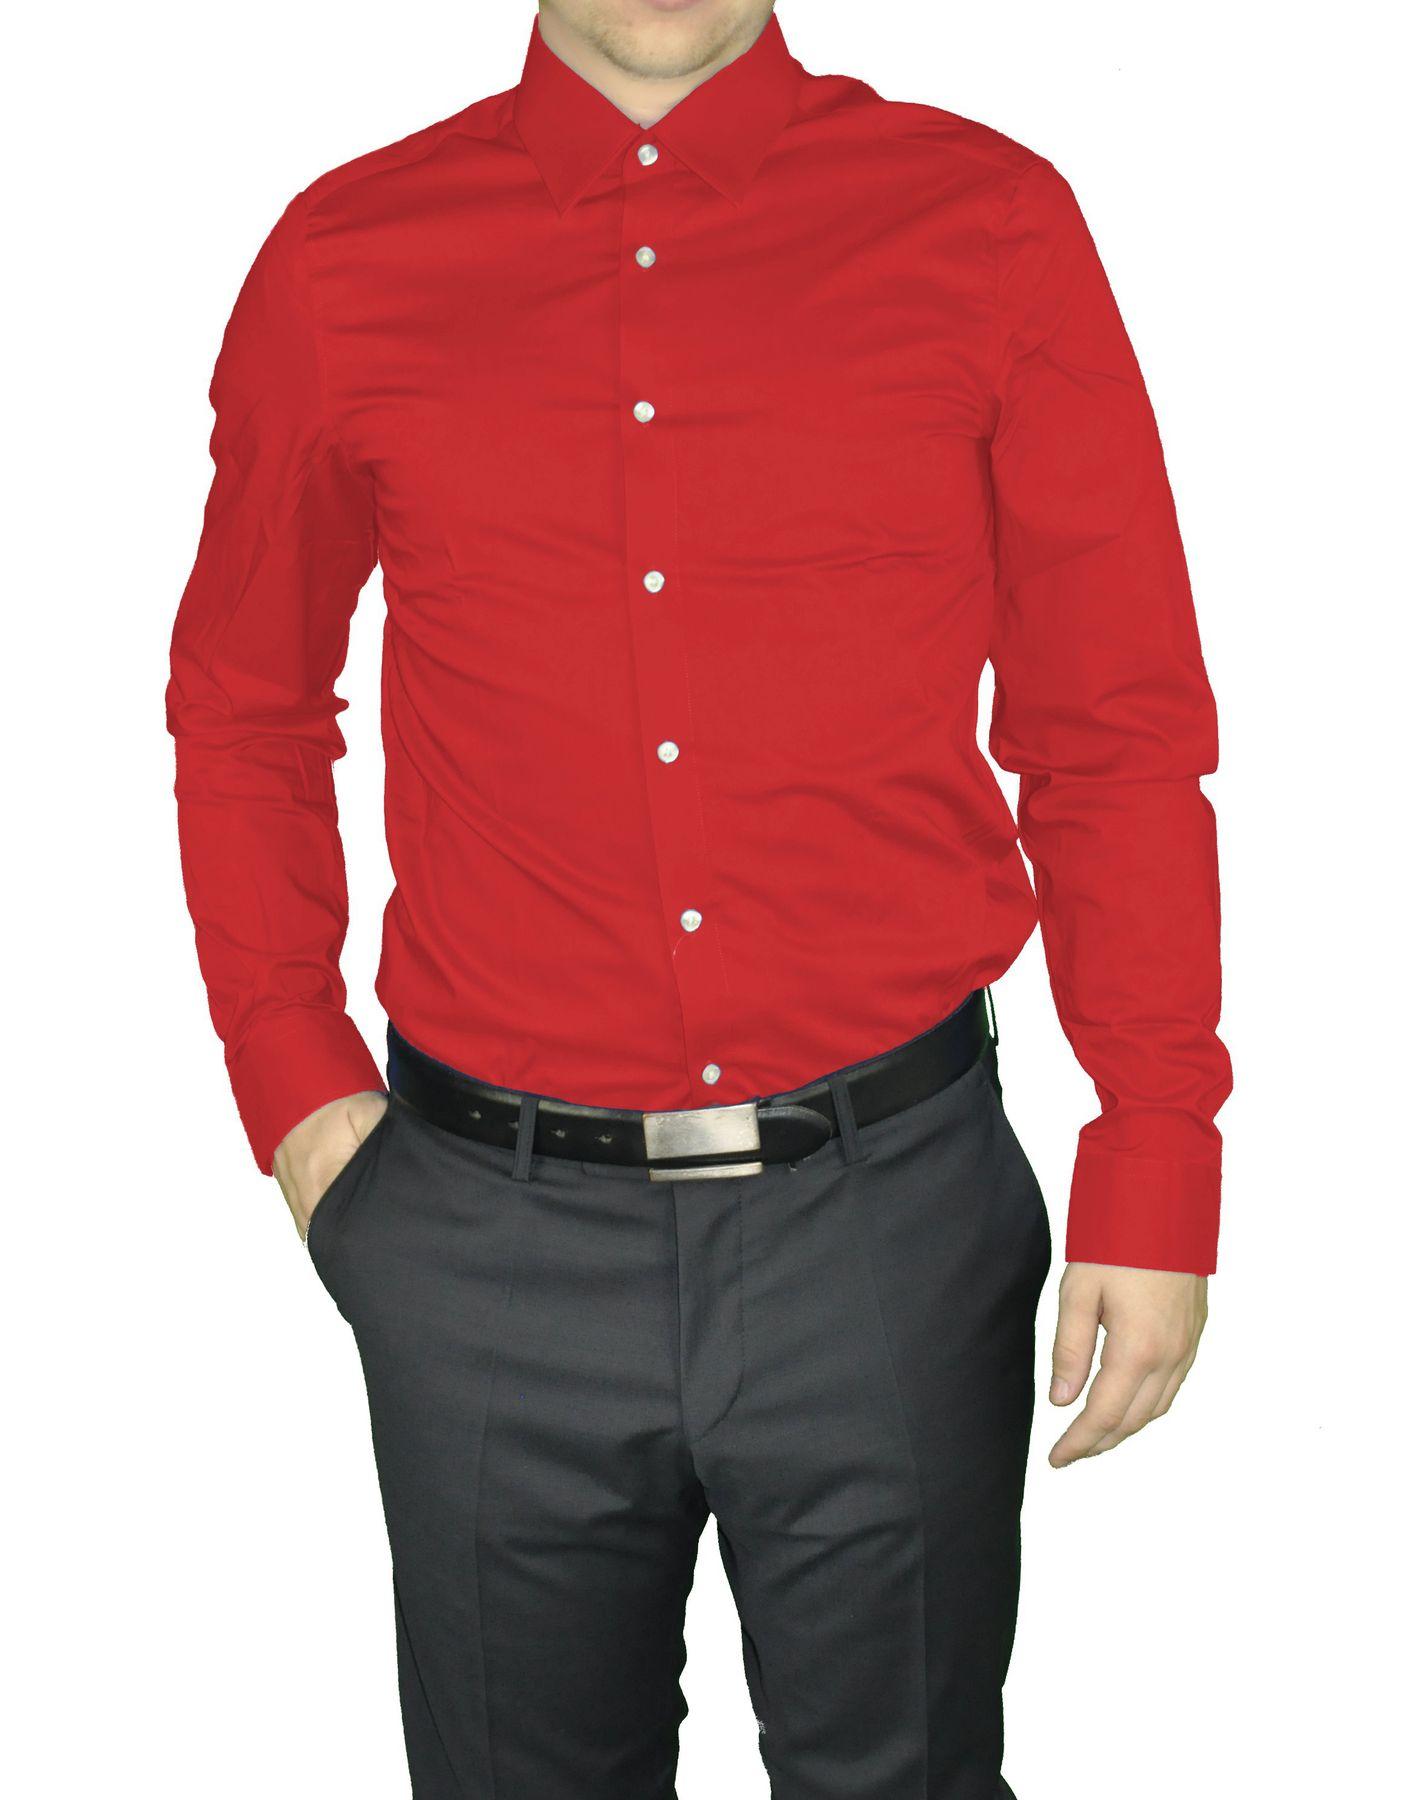 Redmond - Herren Slim Fit Hemd in verschiedenen Farben (400130/17A) – Bild 14